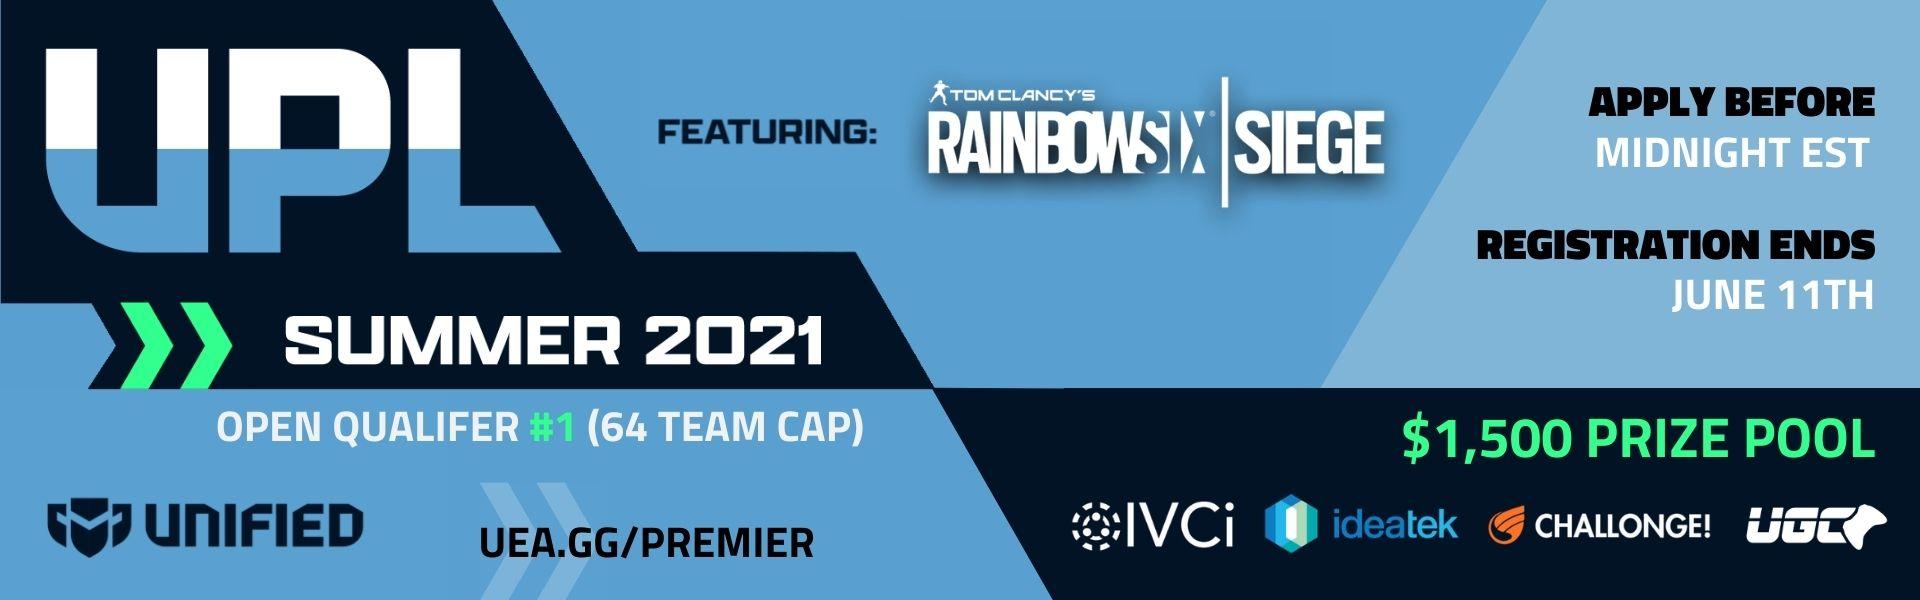 Unified Rainbow Six Open Qualifier 1